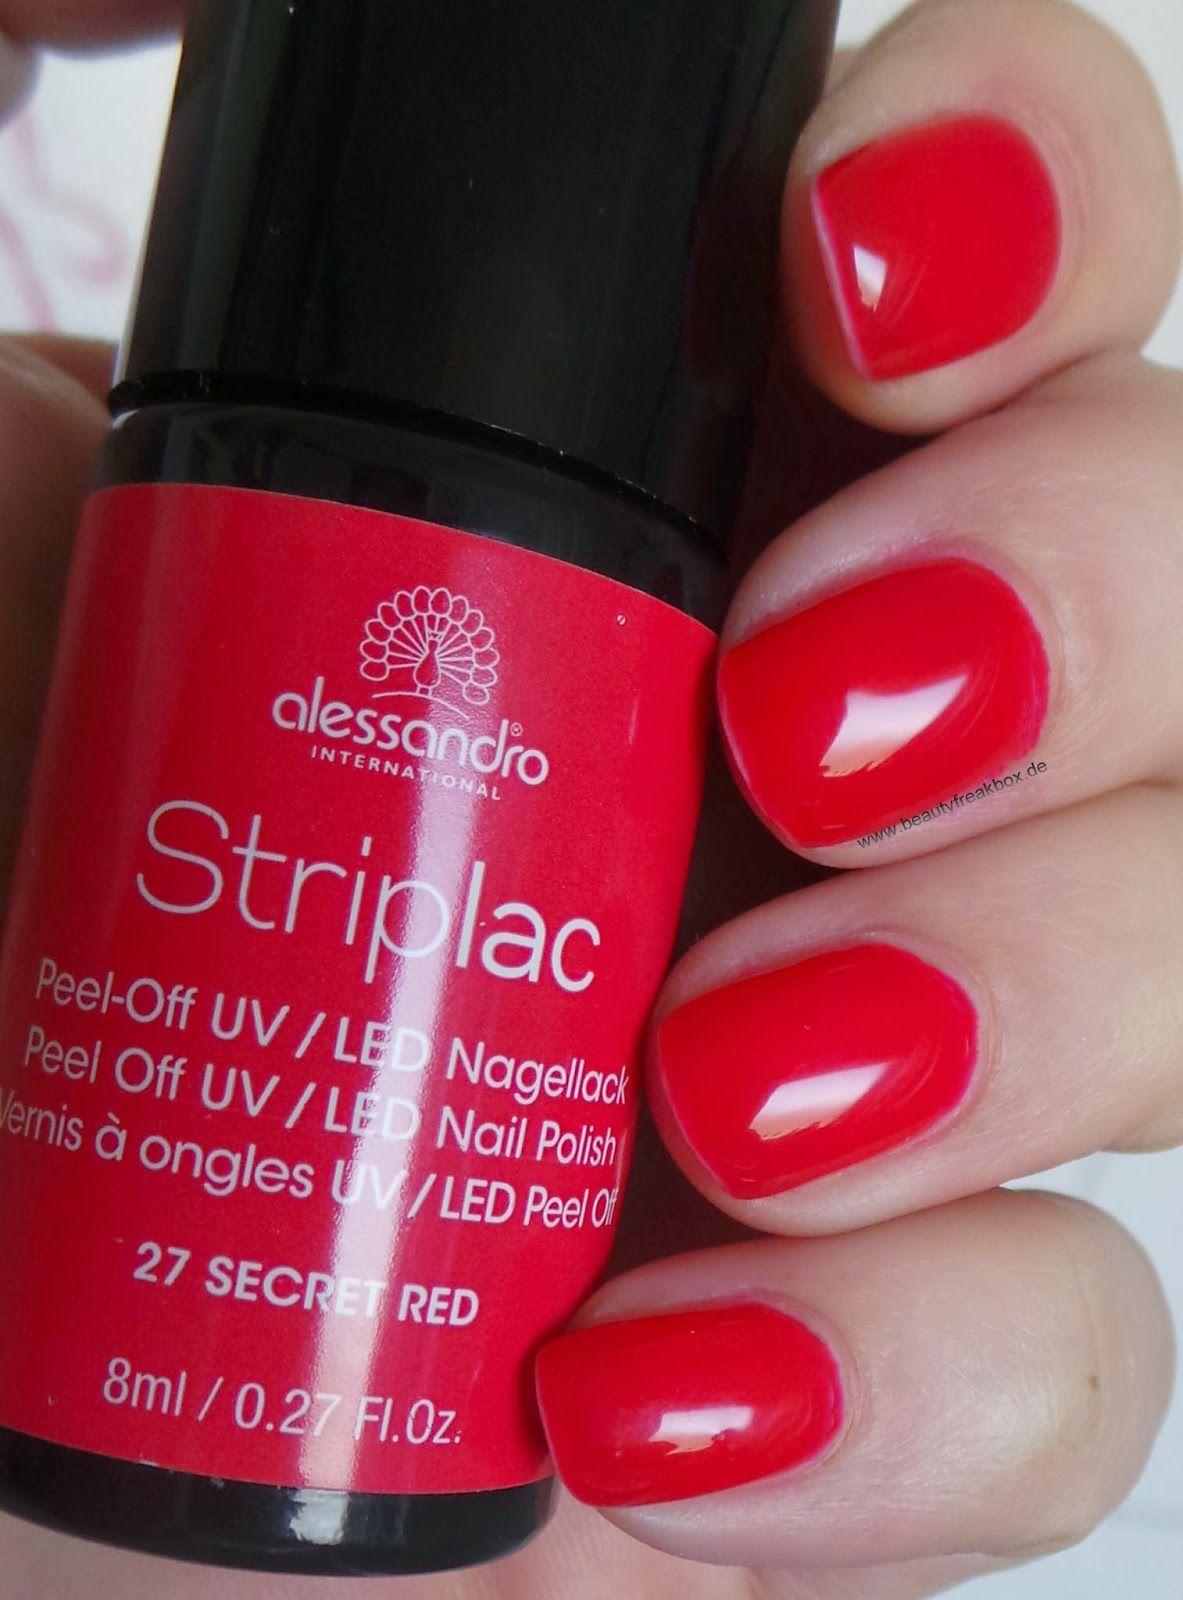 Alessandro International Striplac Peel Off Uv Led Nagellack 27 Secret Red Striplac Nagellack Gel Farbe